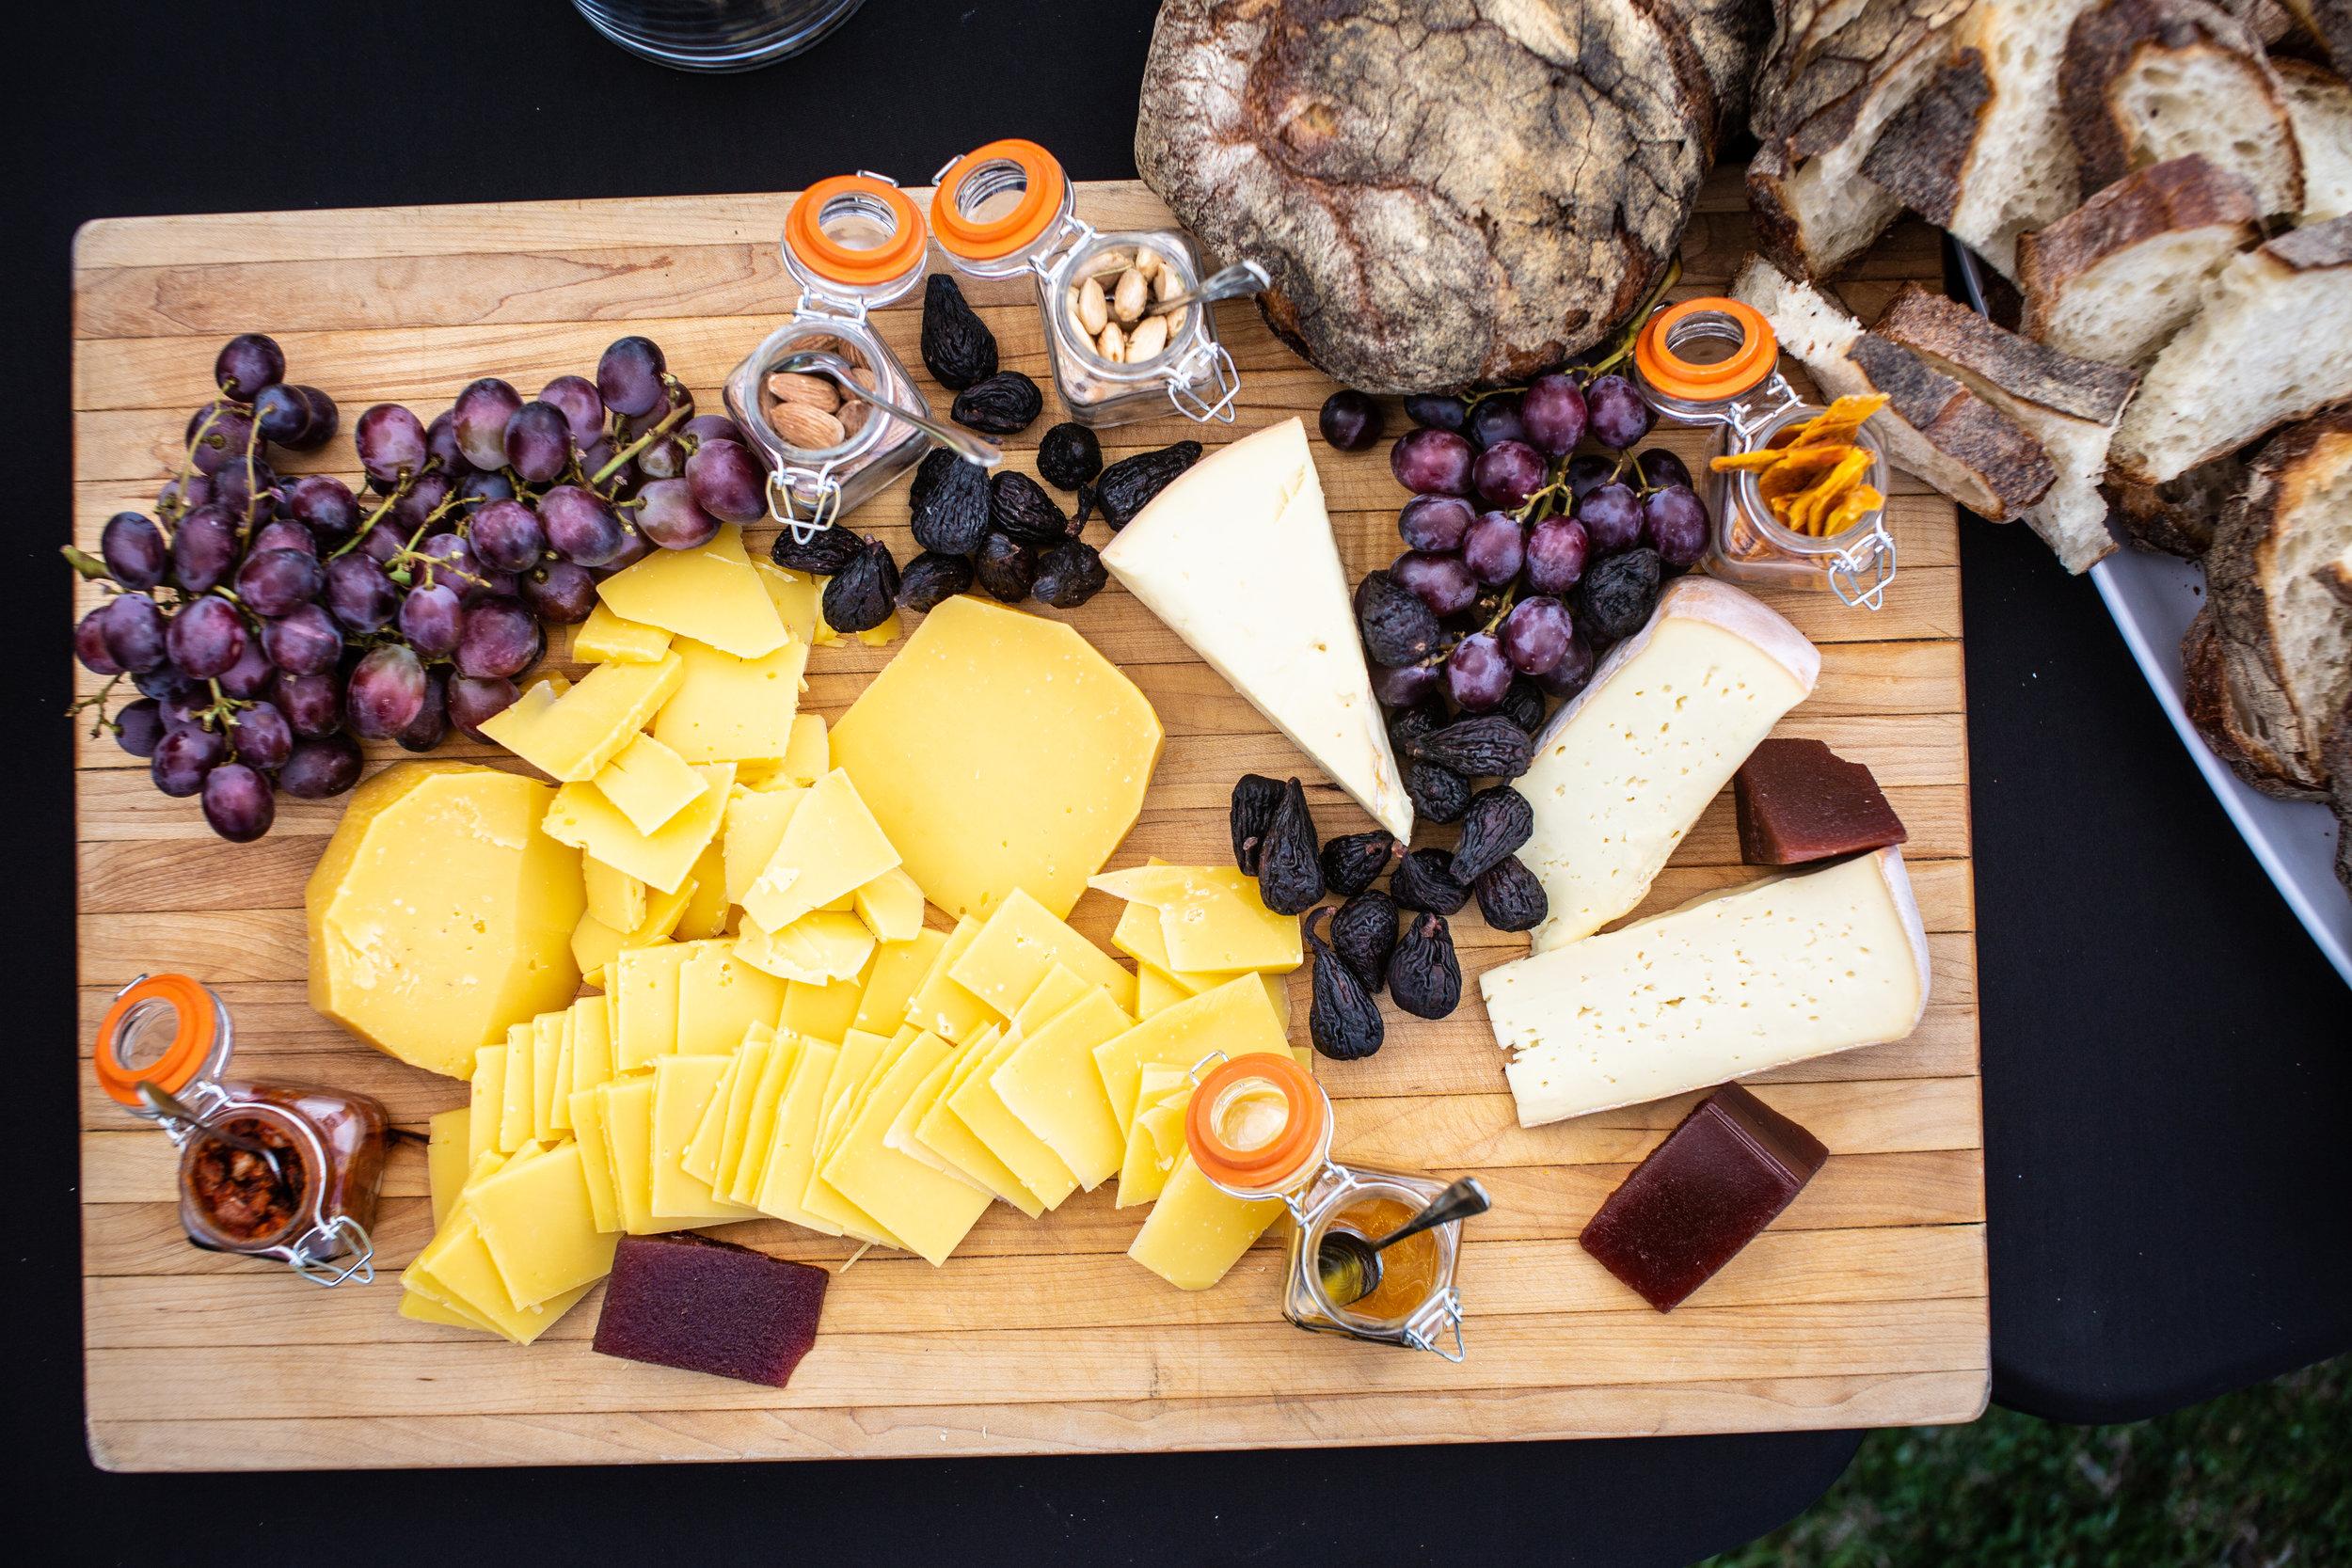 cheese board-catering-wood-craft-bbq-nj.jpg